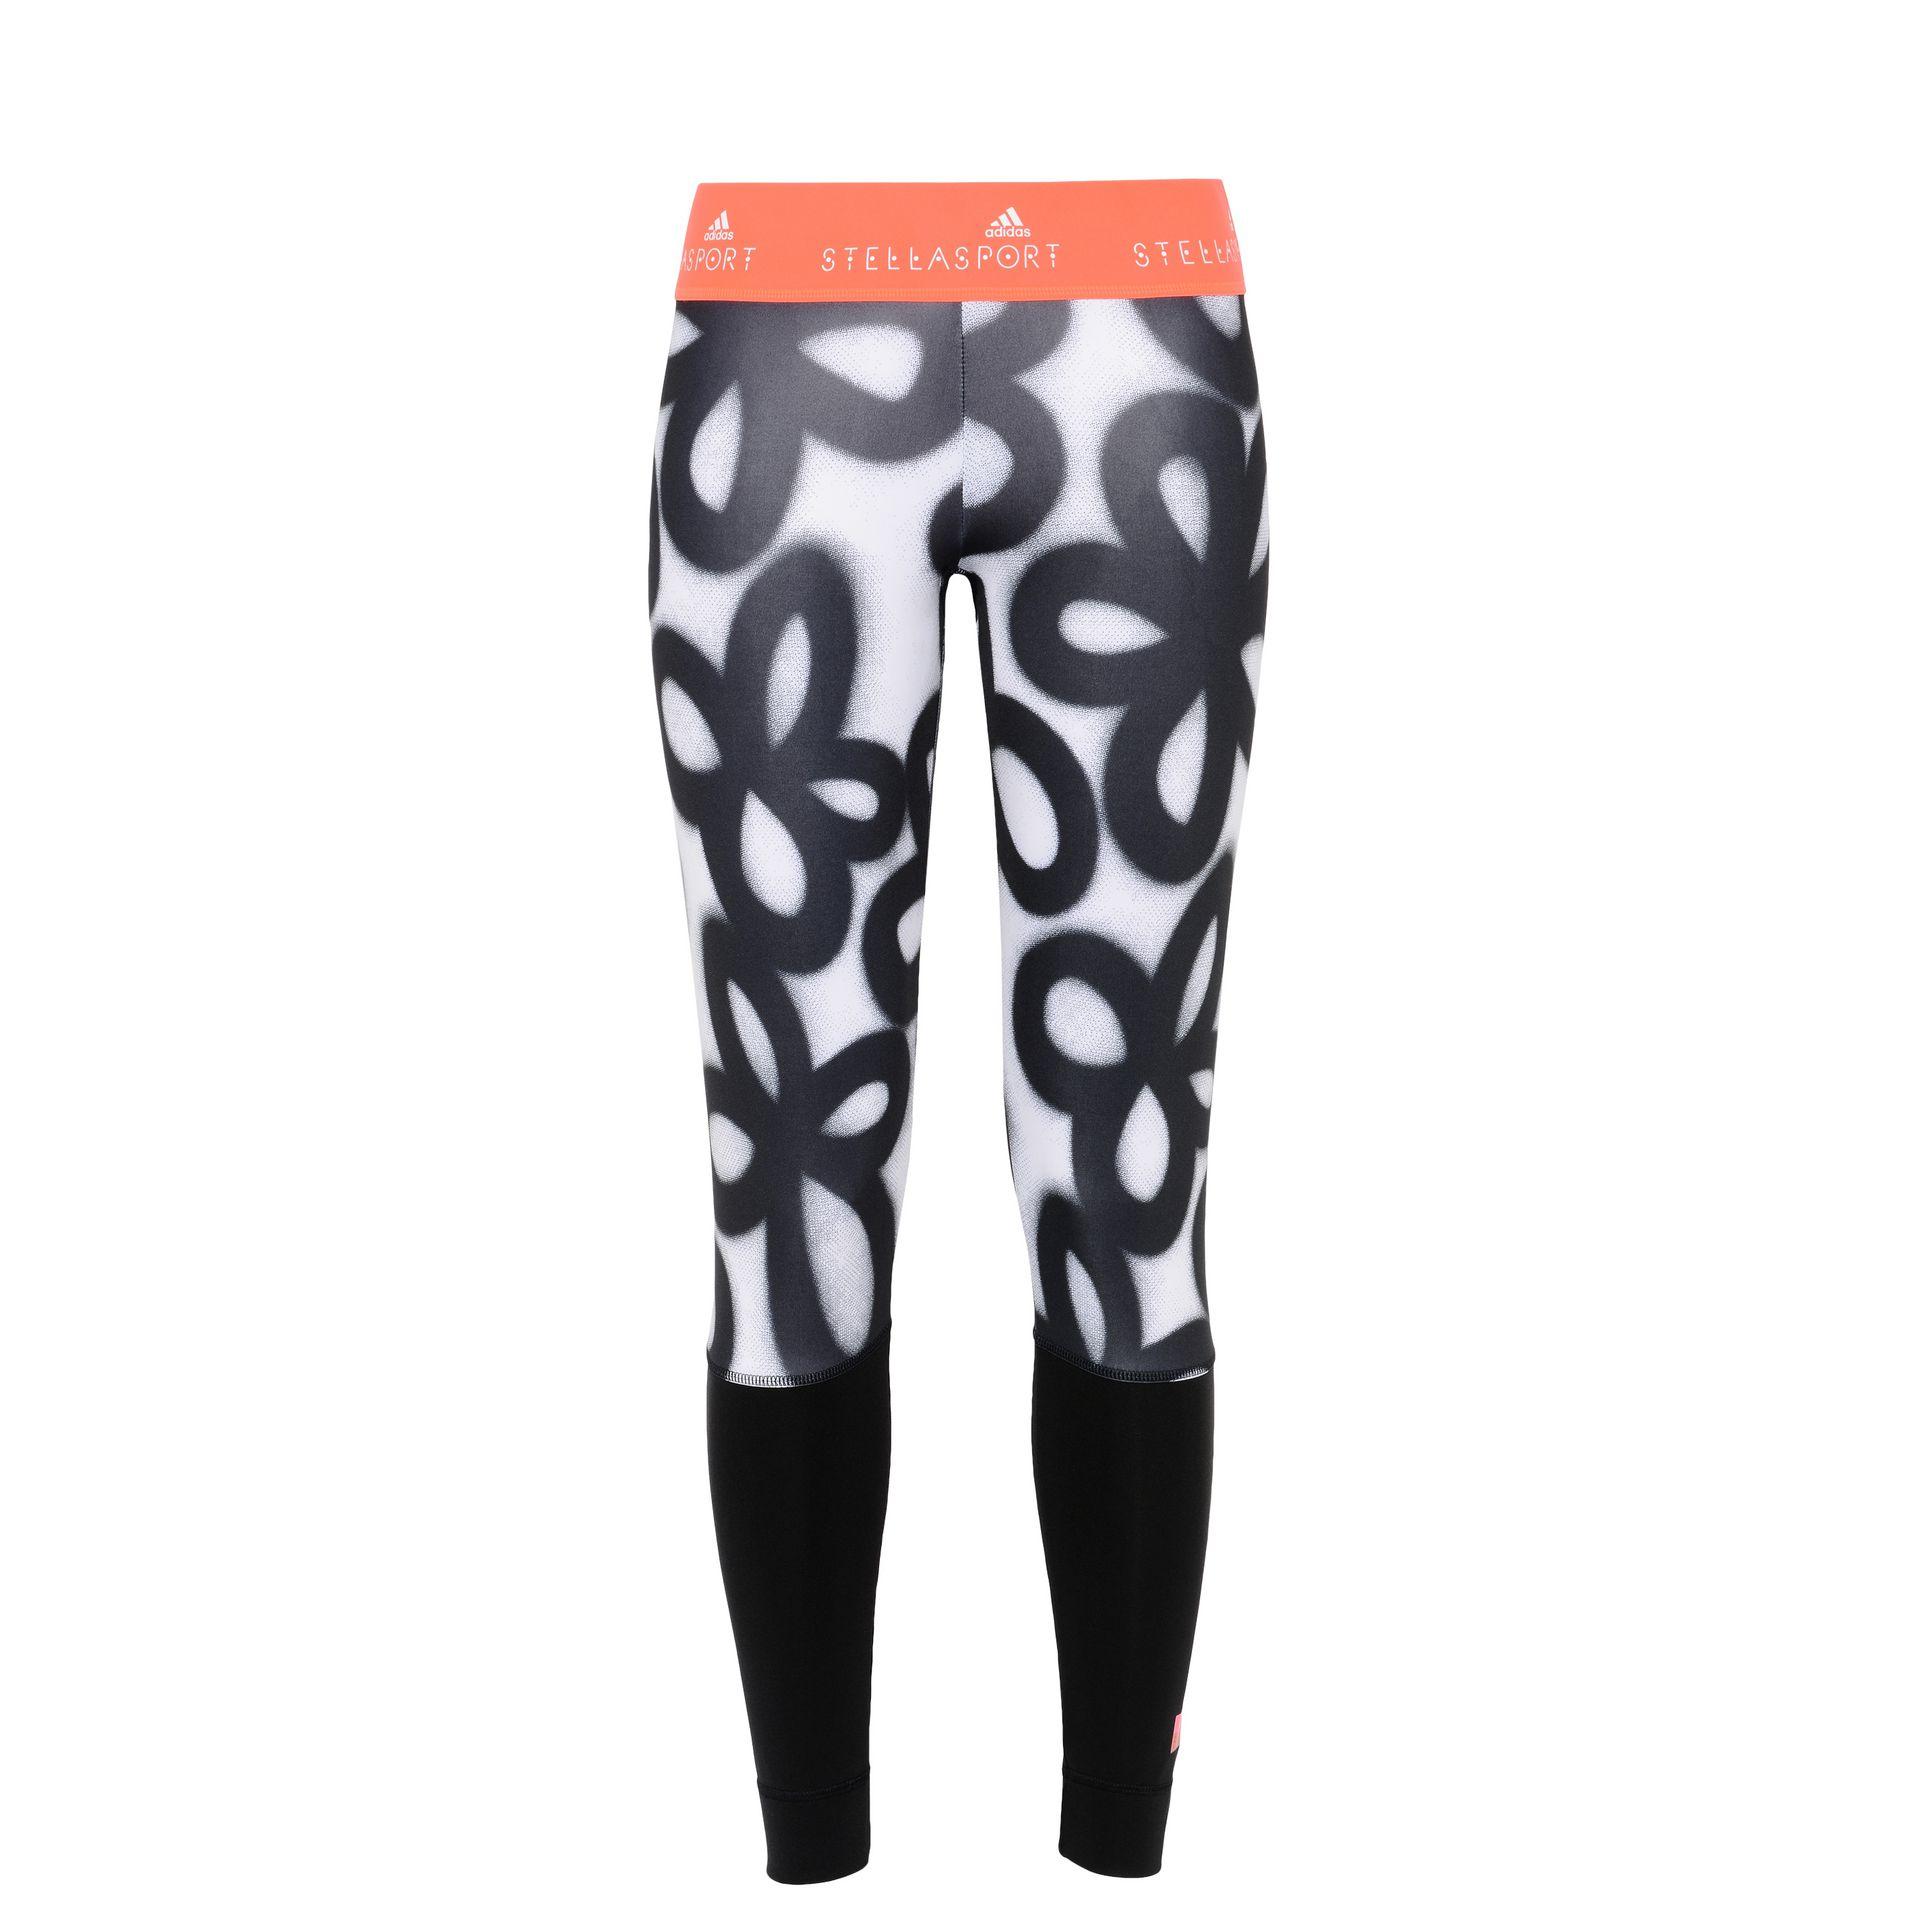 Graphic Floral Print Leggings - Adidas Stellasport